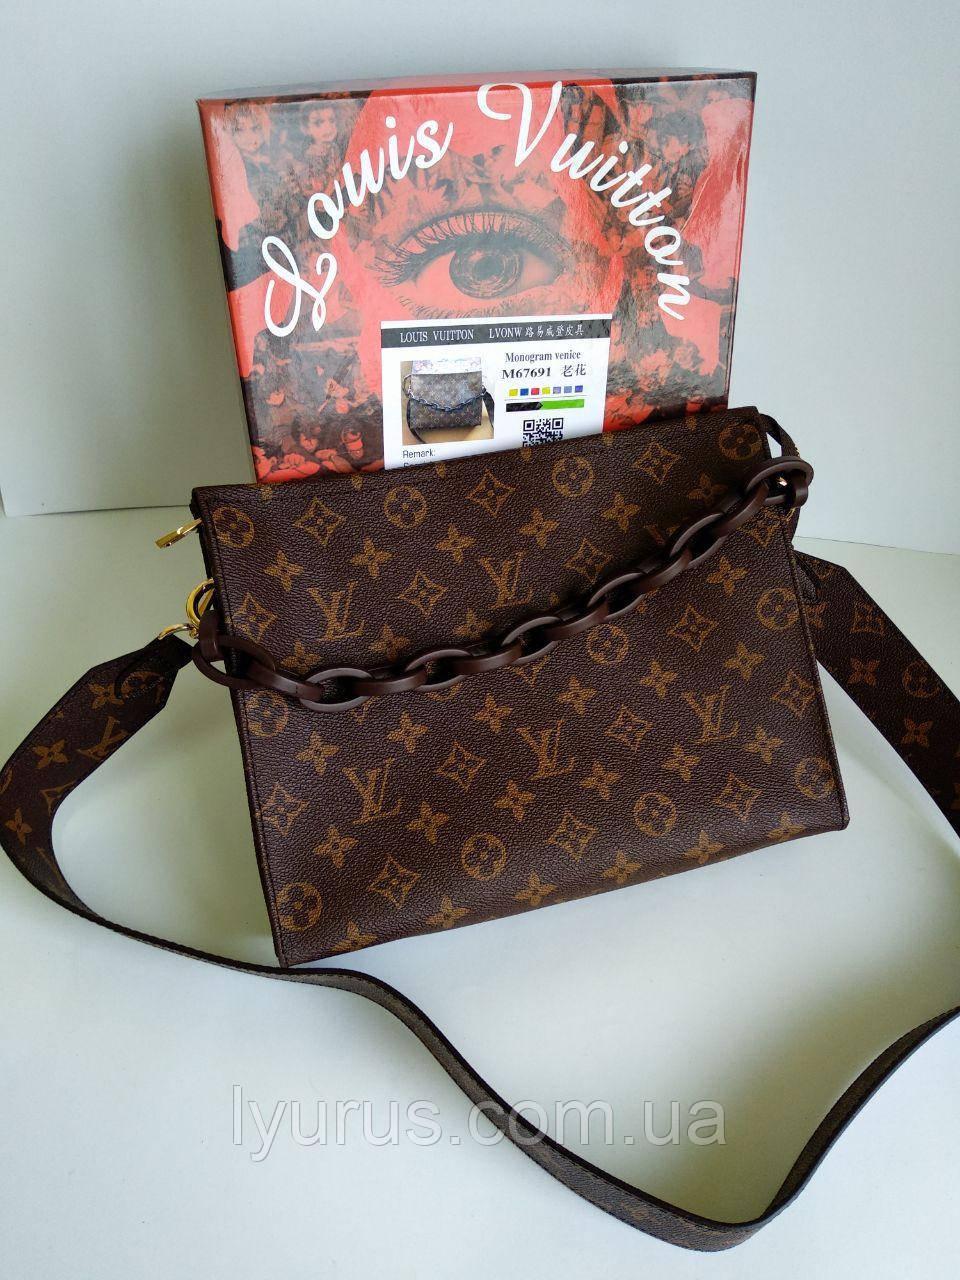 Женская сумка Louis Vuitton канва